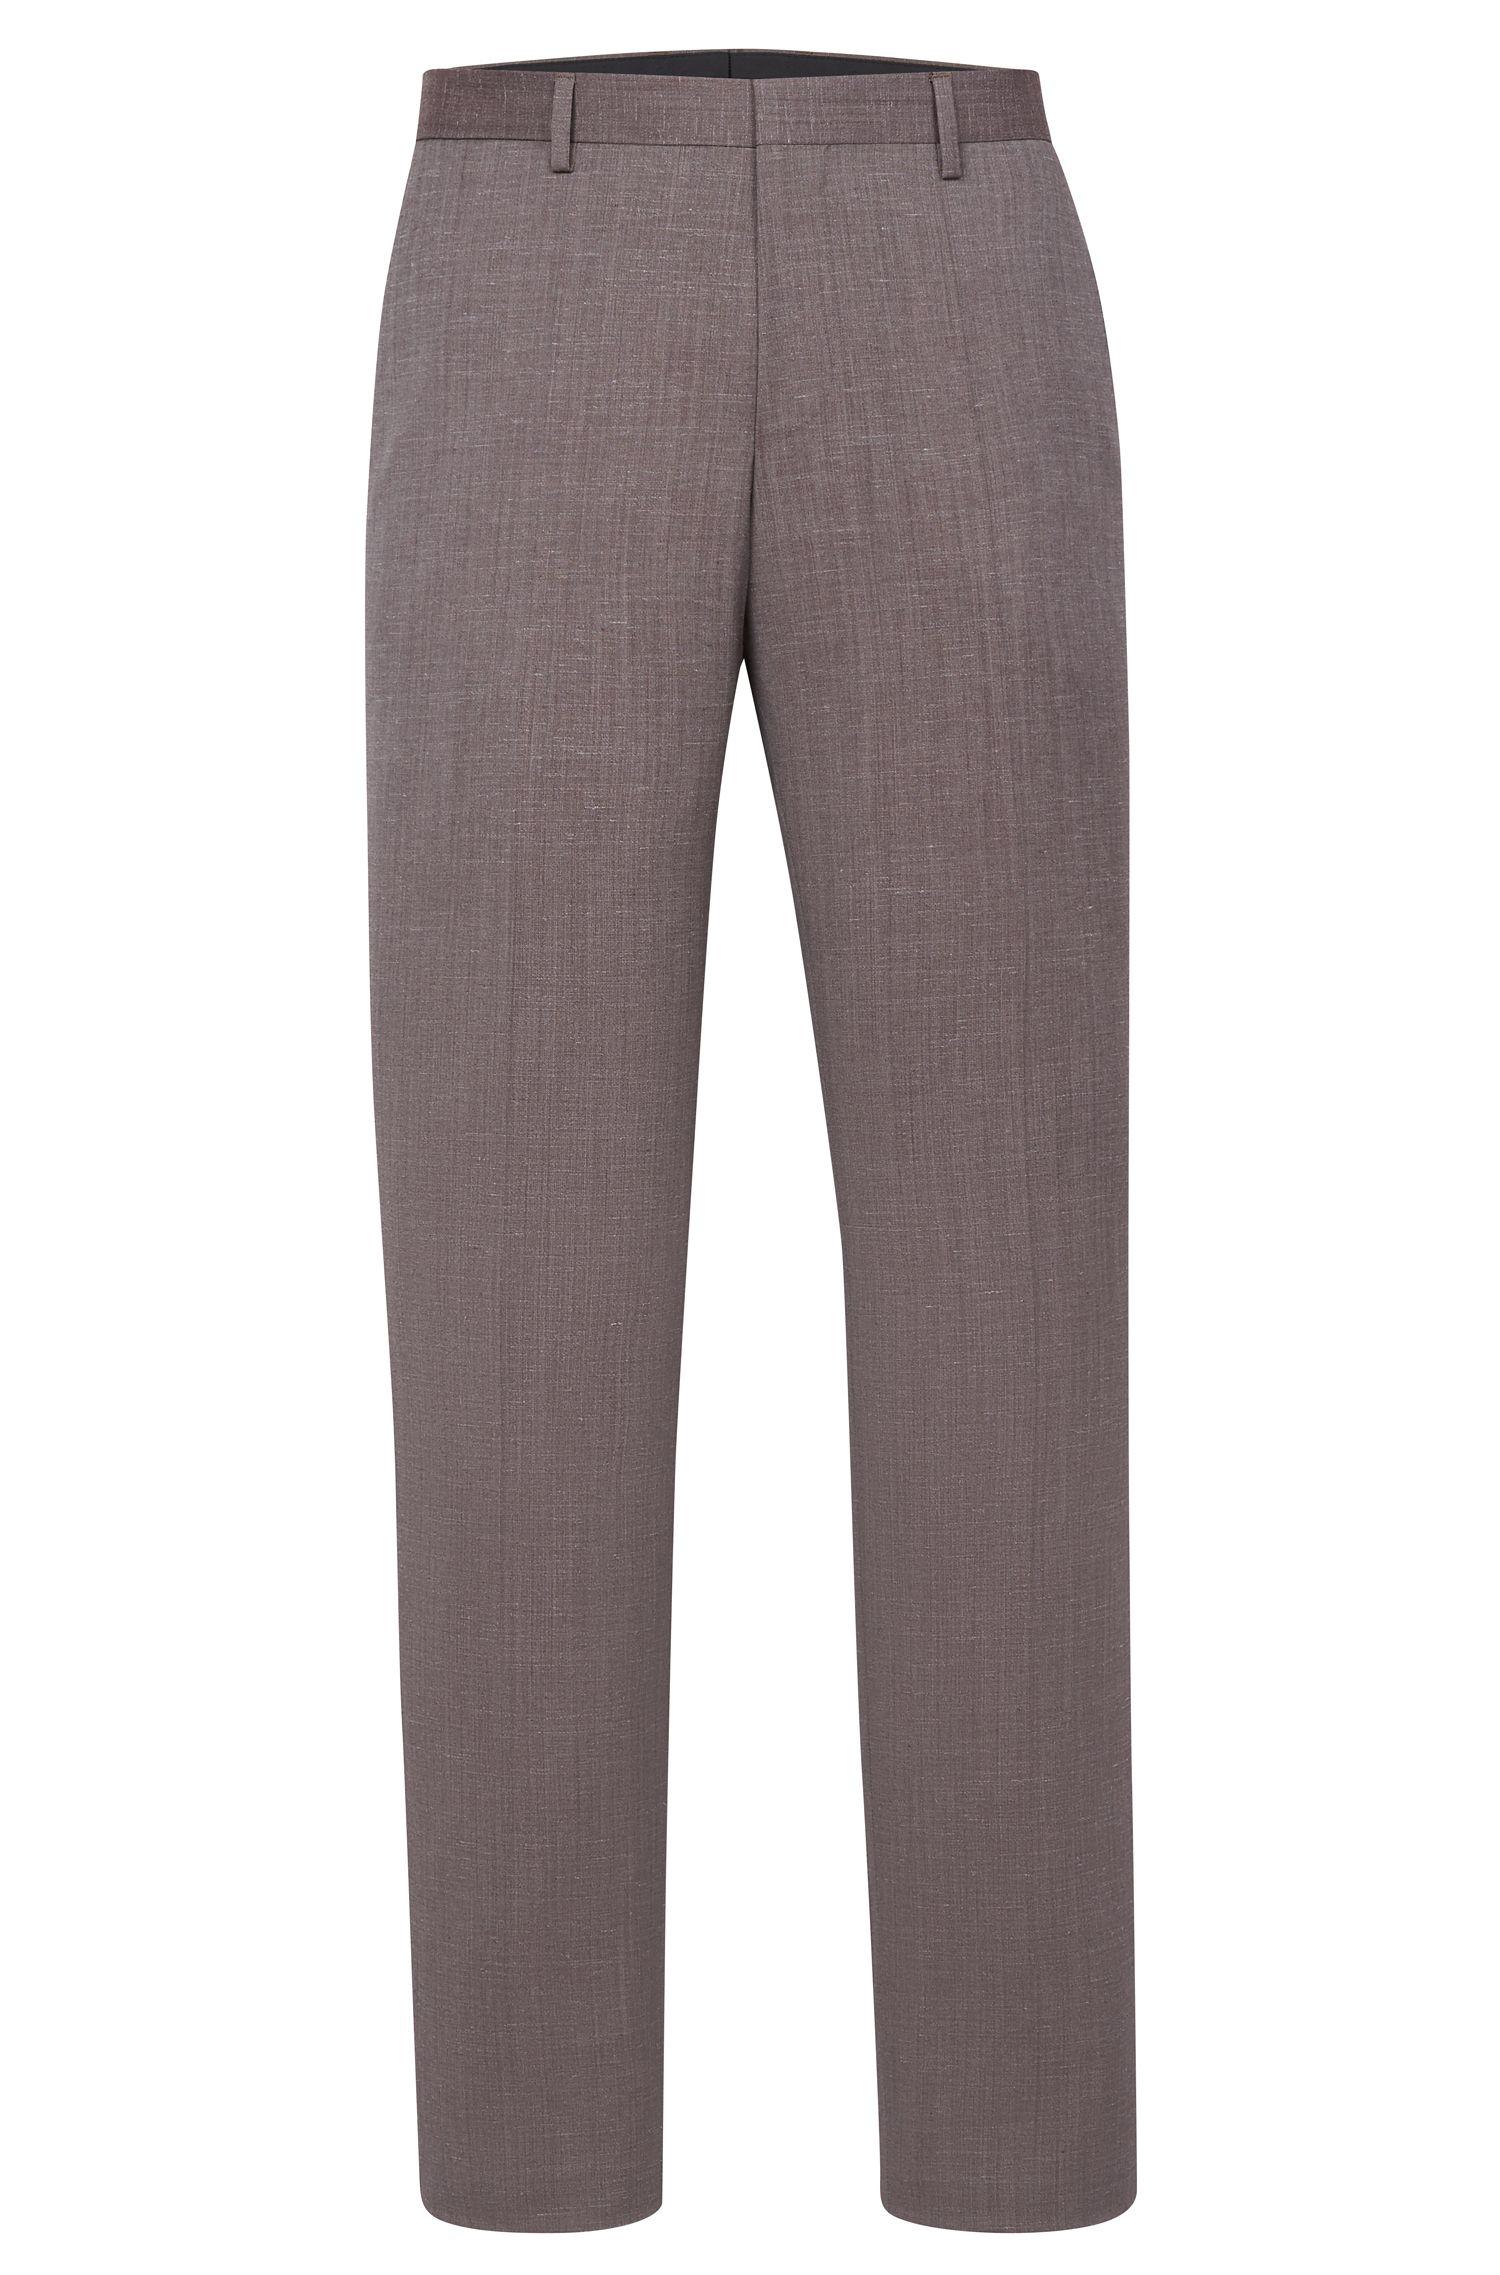 'Benso' | Slim Fit, Super 100 Virgin Wool Dress Pants